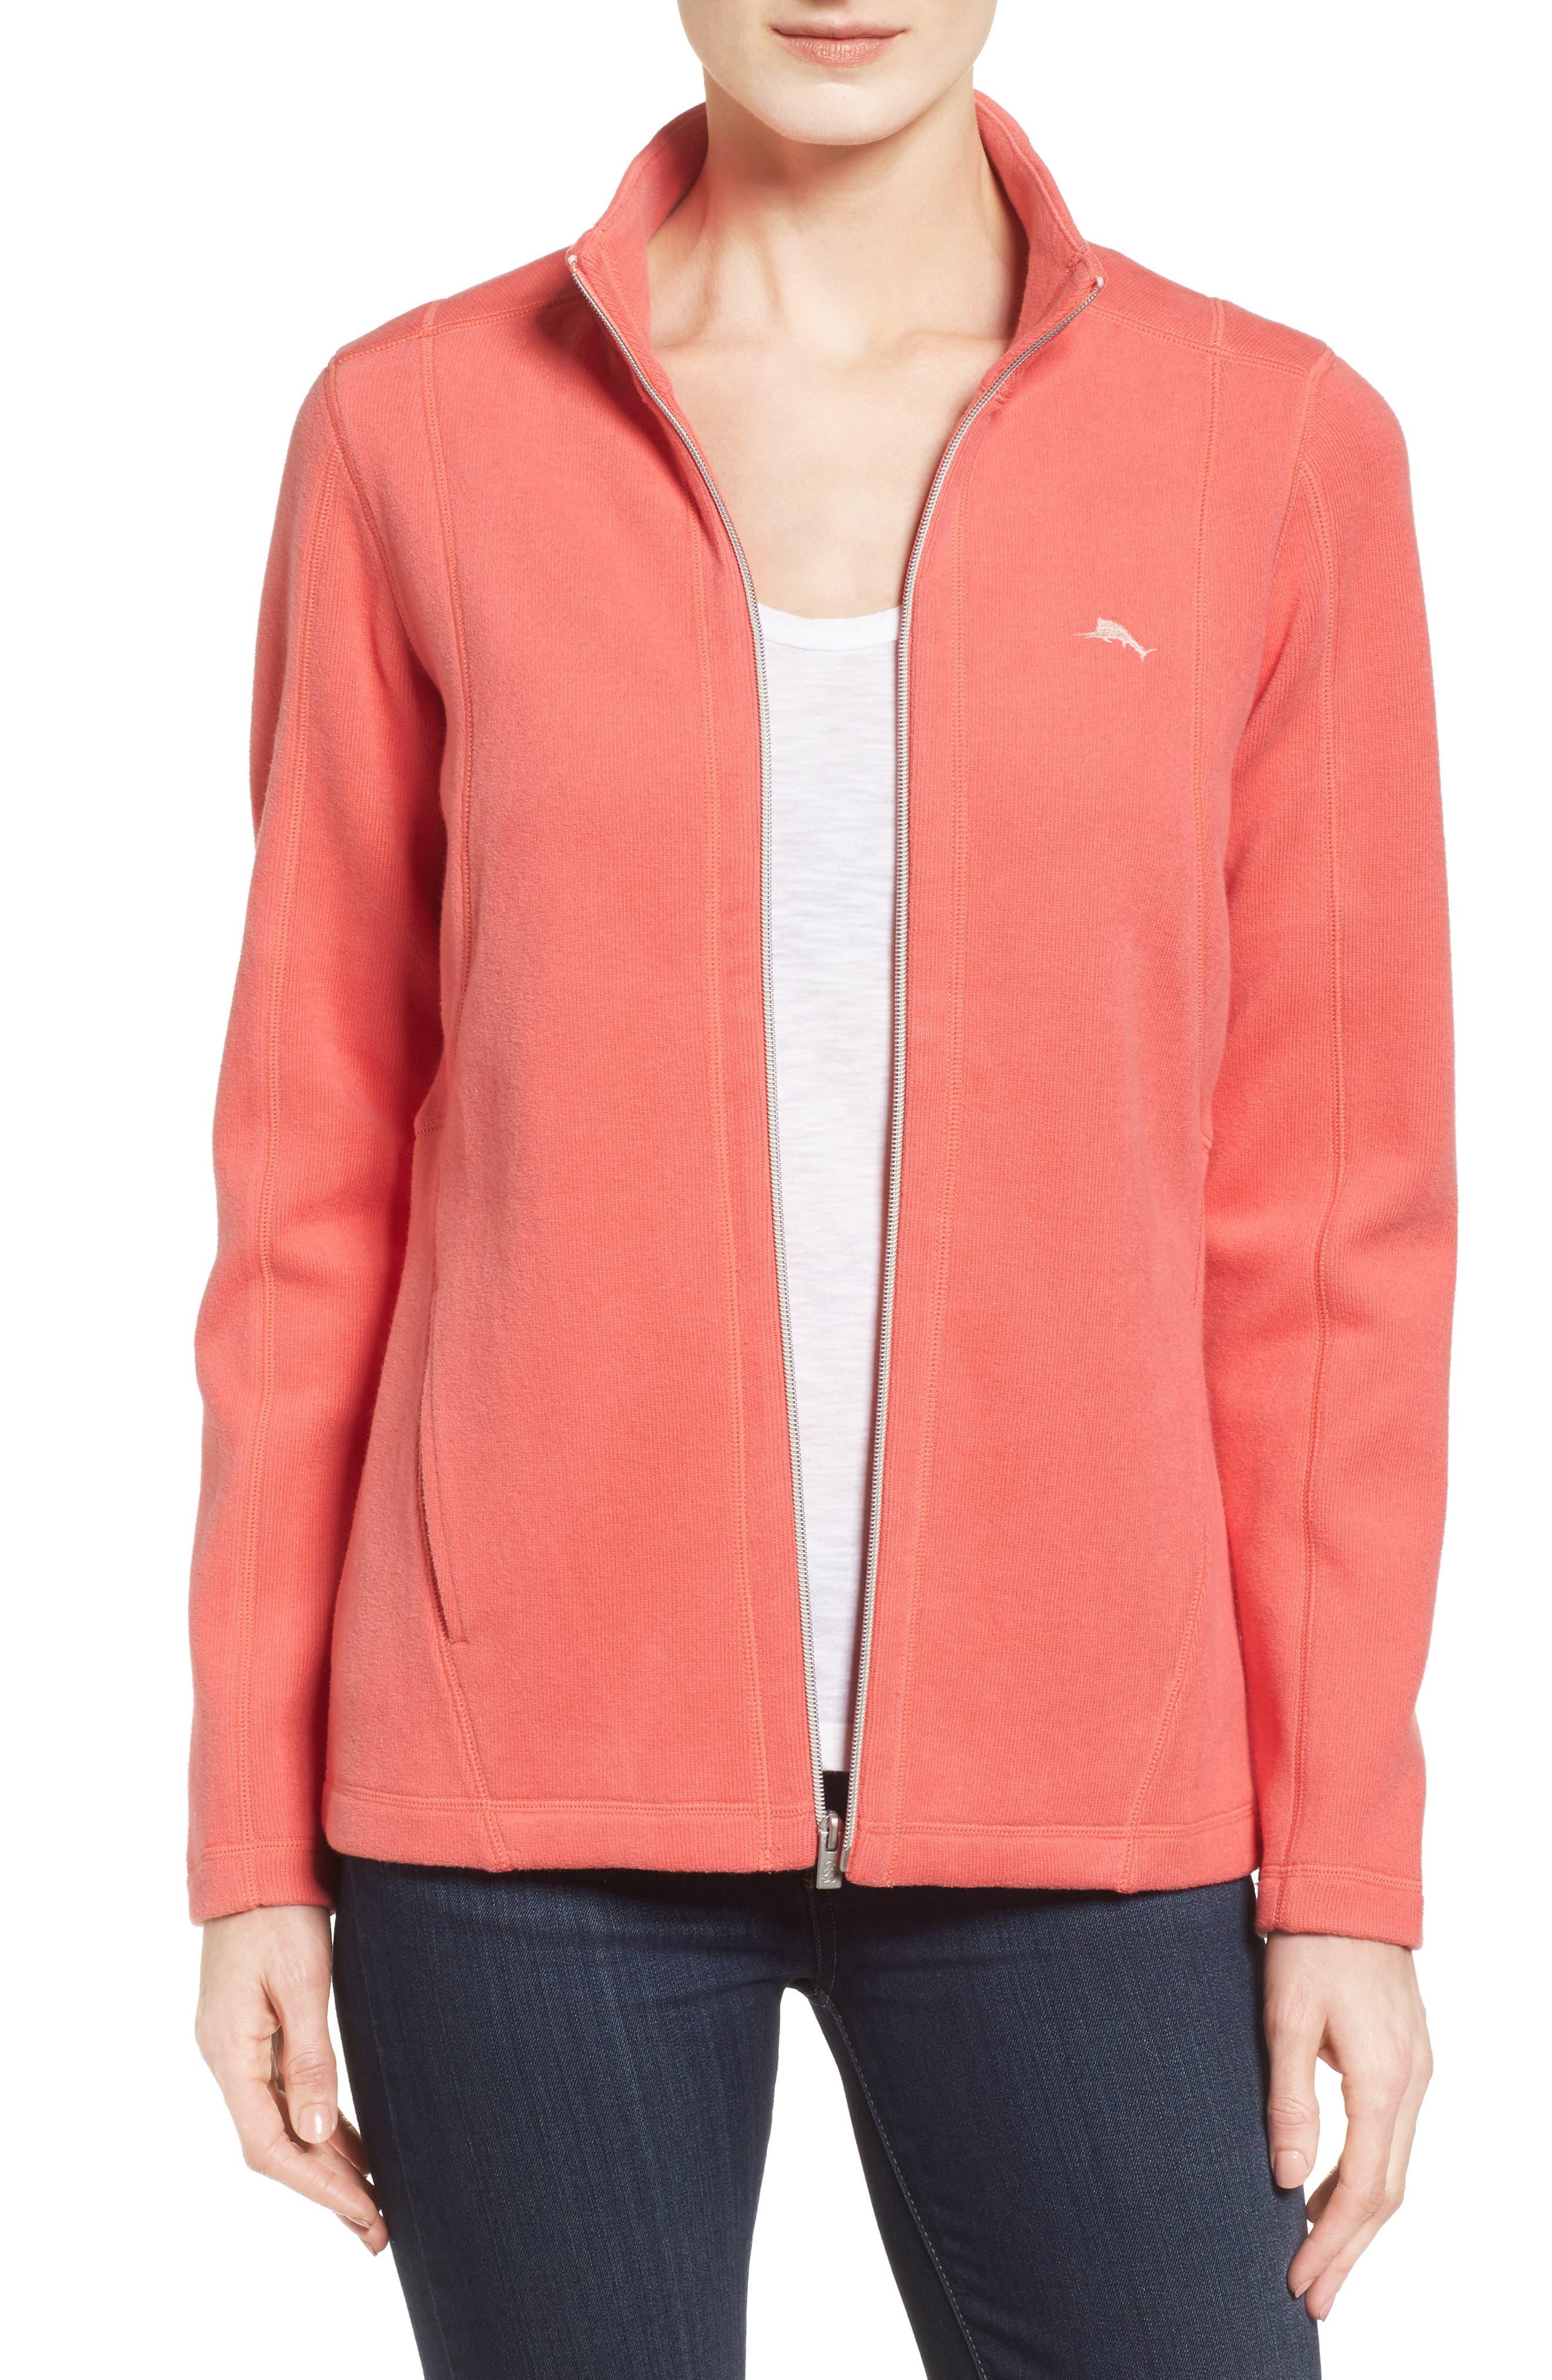 'Aruba' Full Zip Sweatshirt,                             Main thumbnail 8, color,